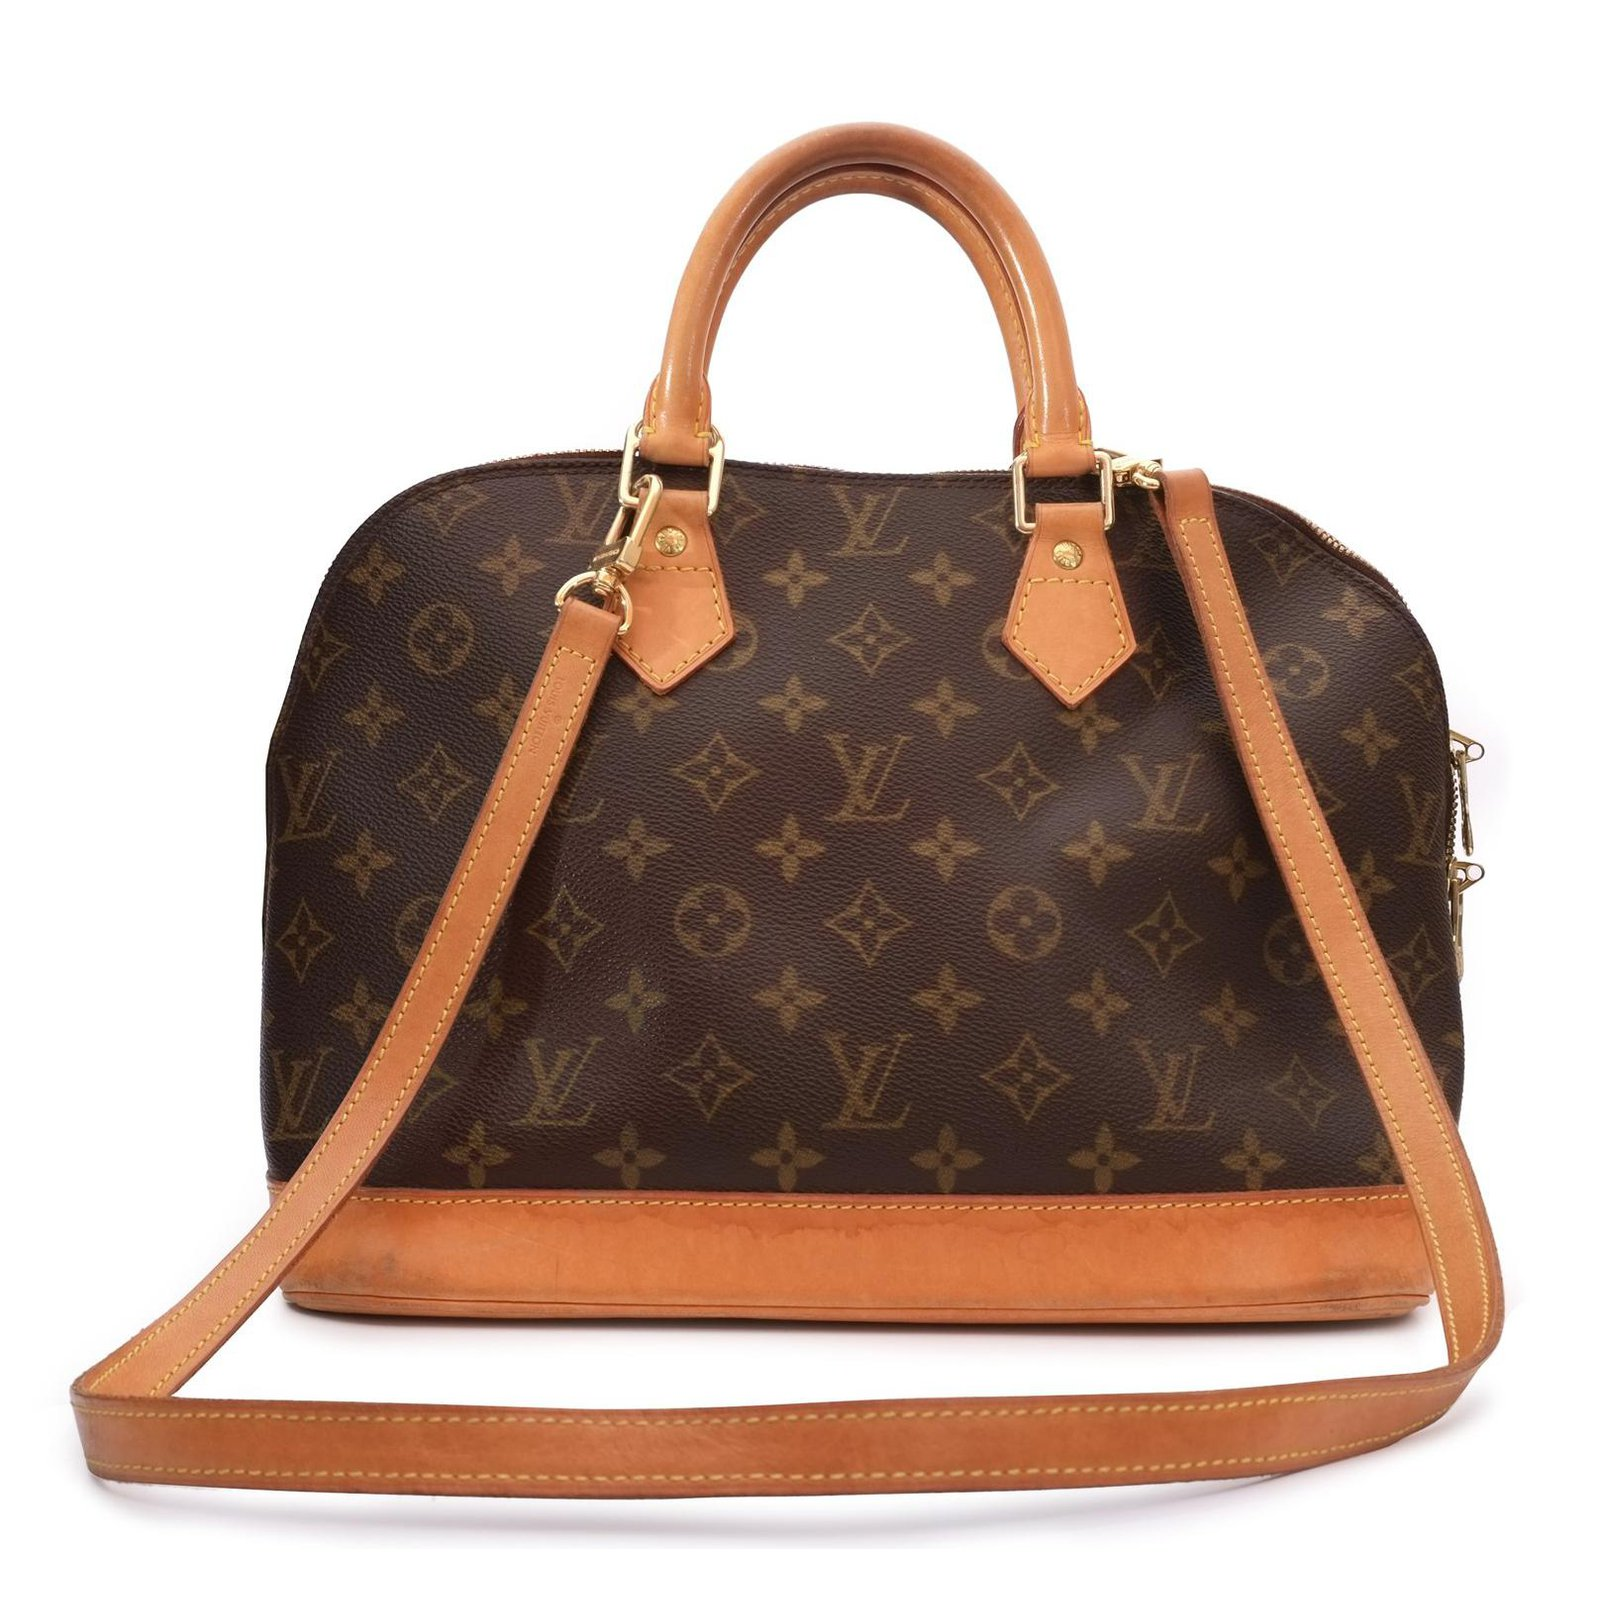 0c6e0ffb2908 Louis Vuitton Louis Vuitton Alma Monogrammed shoulder bag in good  condition! Handbags Leather